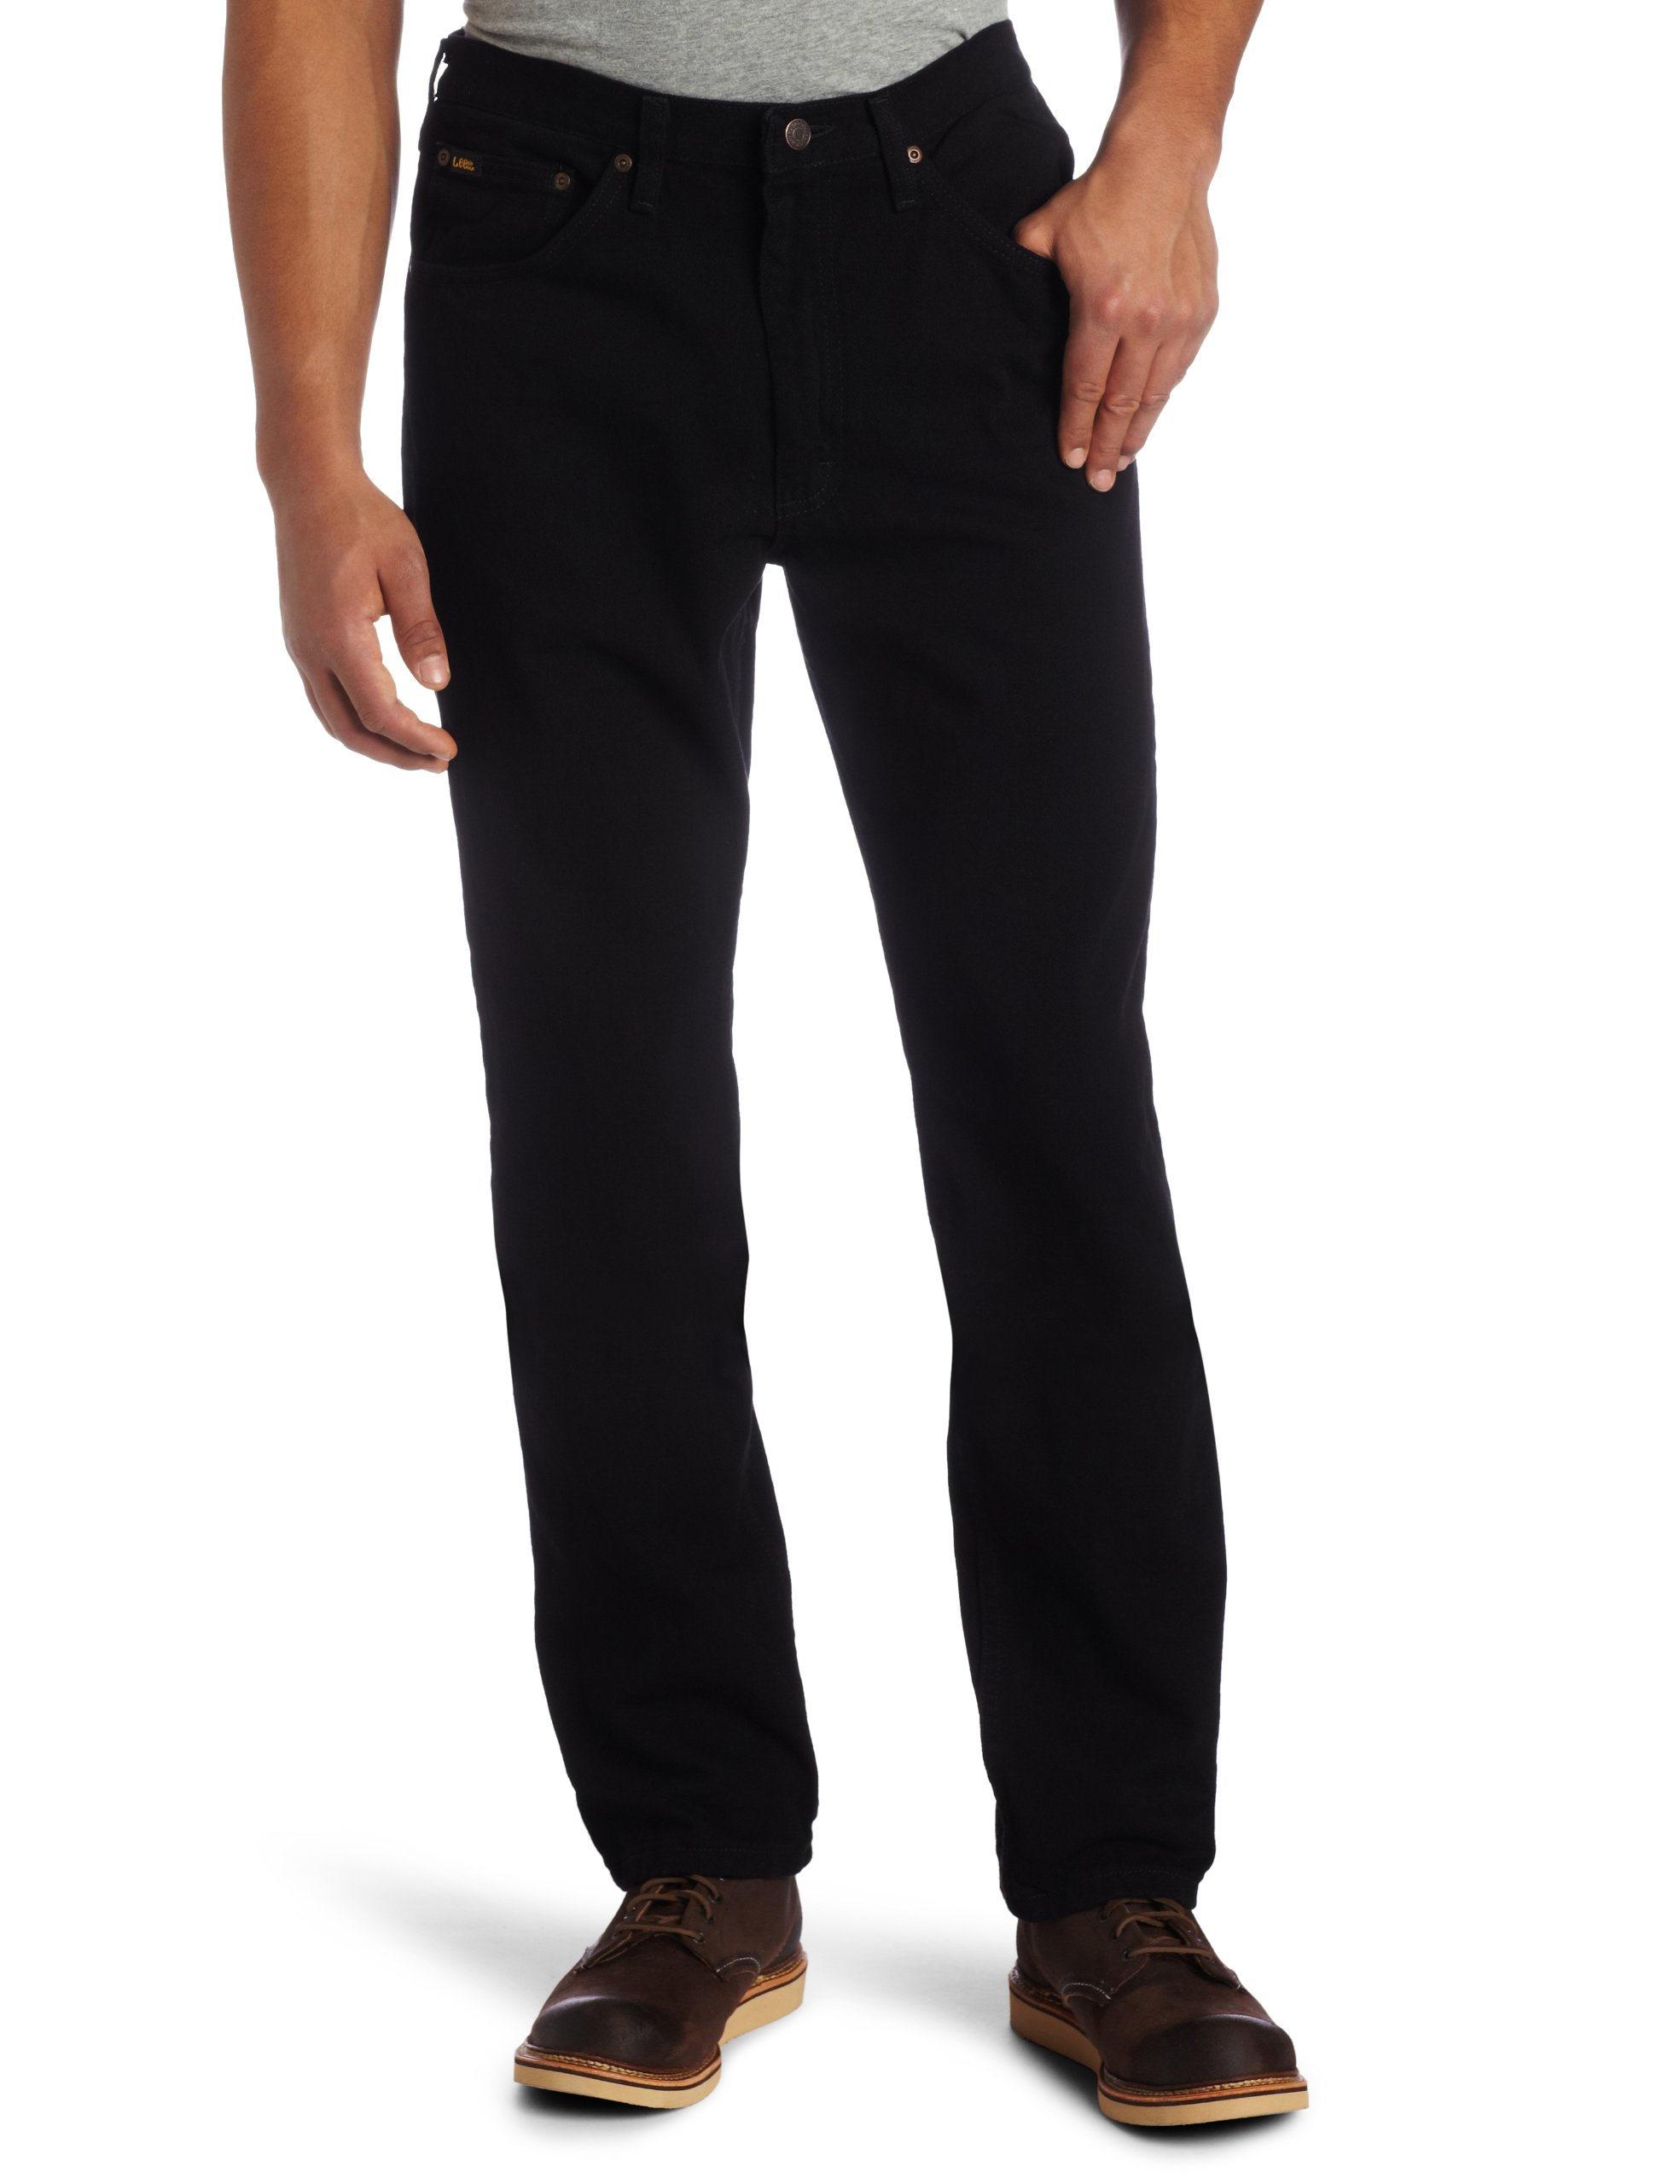 Lee Men's Regular Fit Straight Leg Jean, Double Black, 34W x 32L